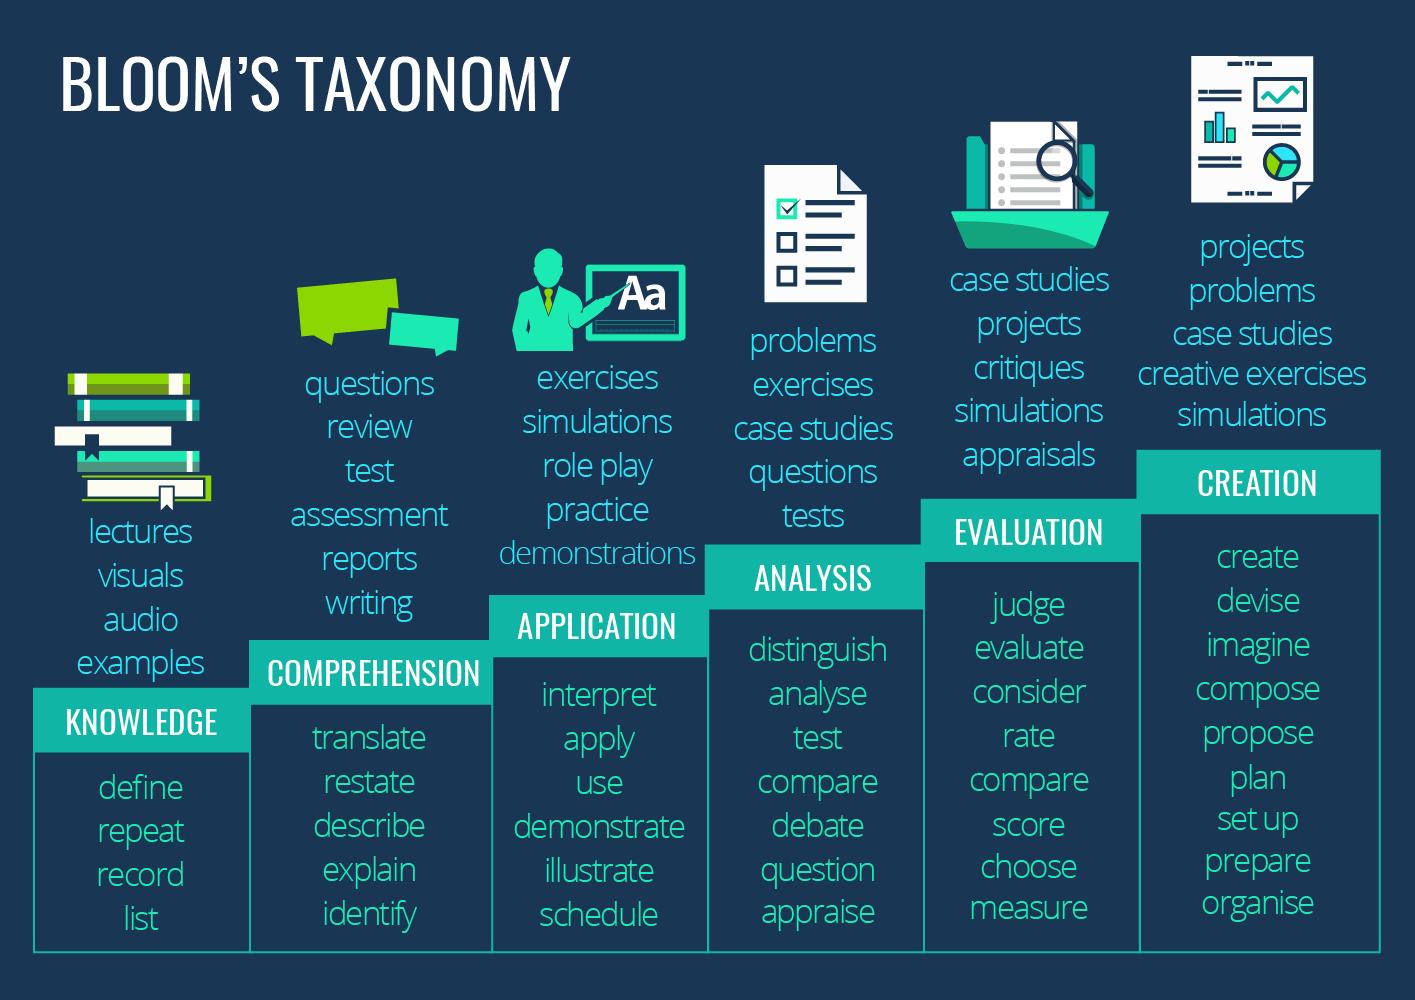 blooms-taxonomy-01